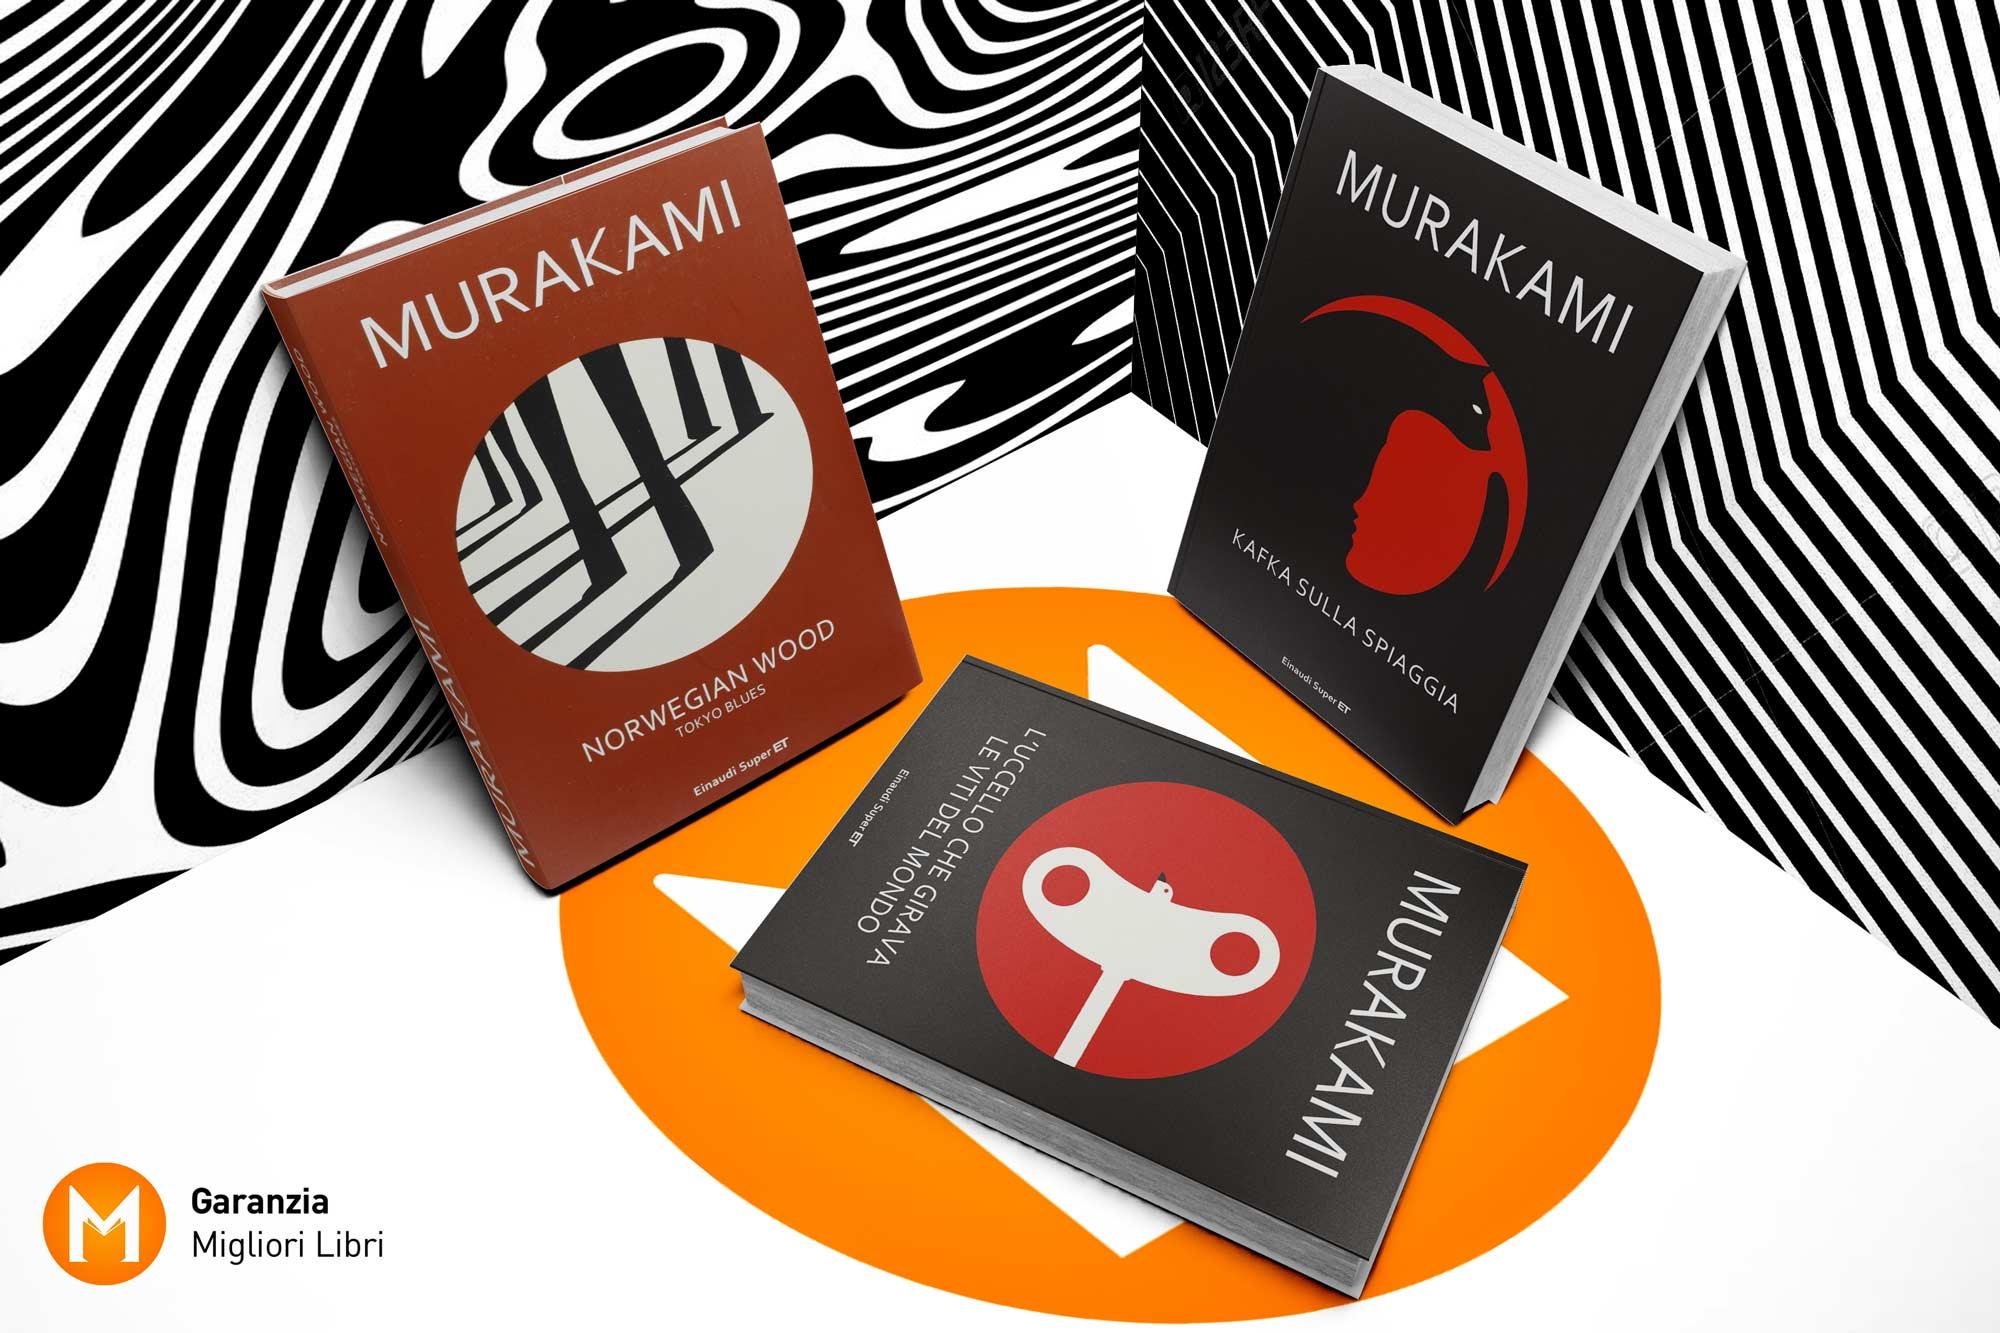 migliori-libri-murakami-da-leggere